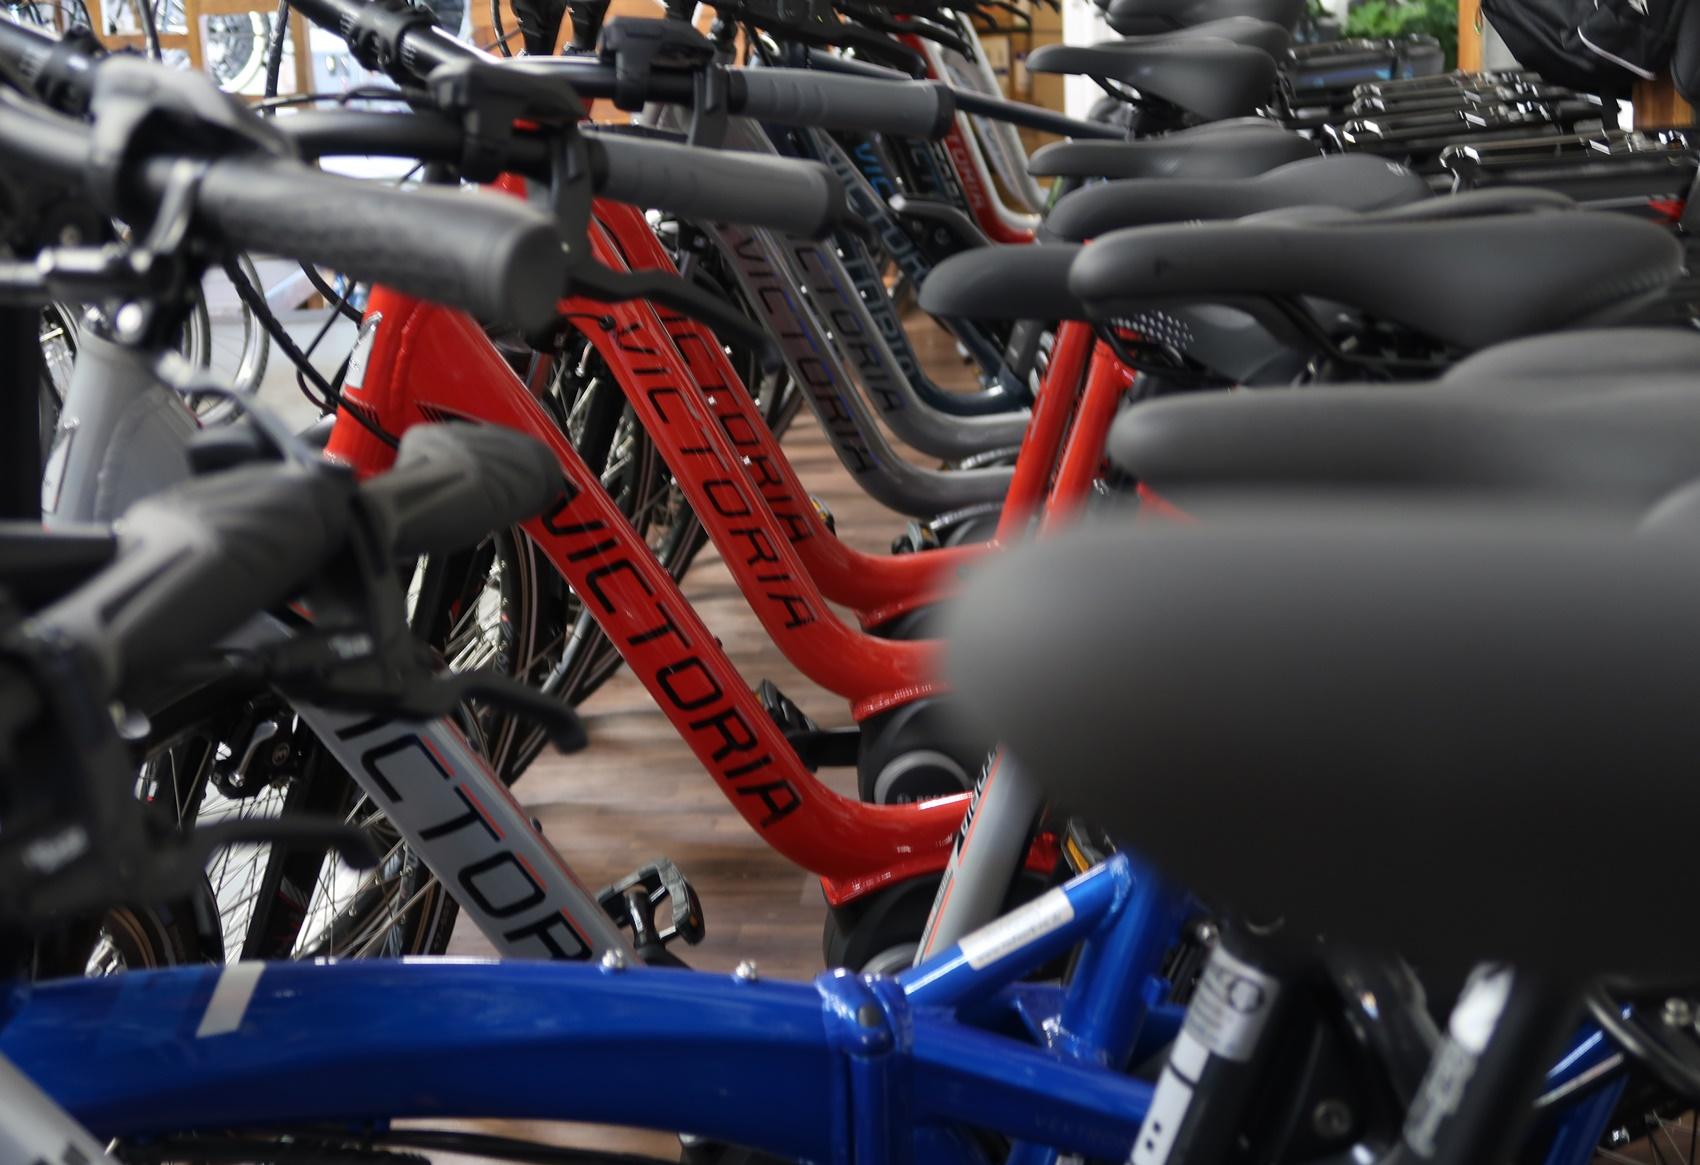 glamupyourlifestyle E-Bike Pedelecs Elektrofahrrad Erfahrung Test Victoria-E-Bike Kauf Akku ü-40-blog -ü50-blog ue-40-blog ue-50-blog